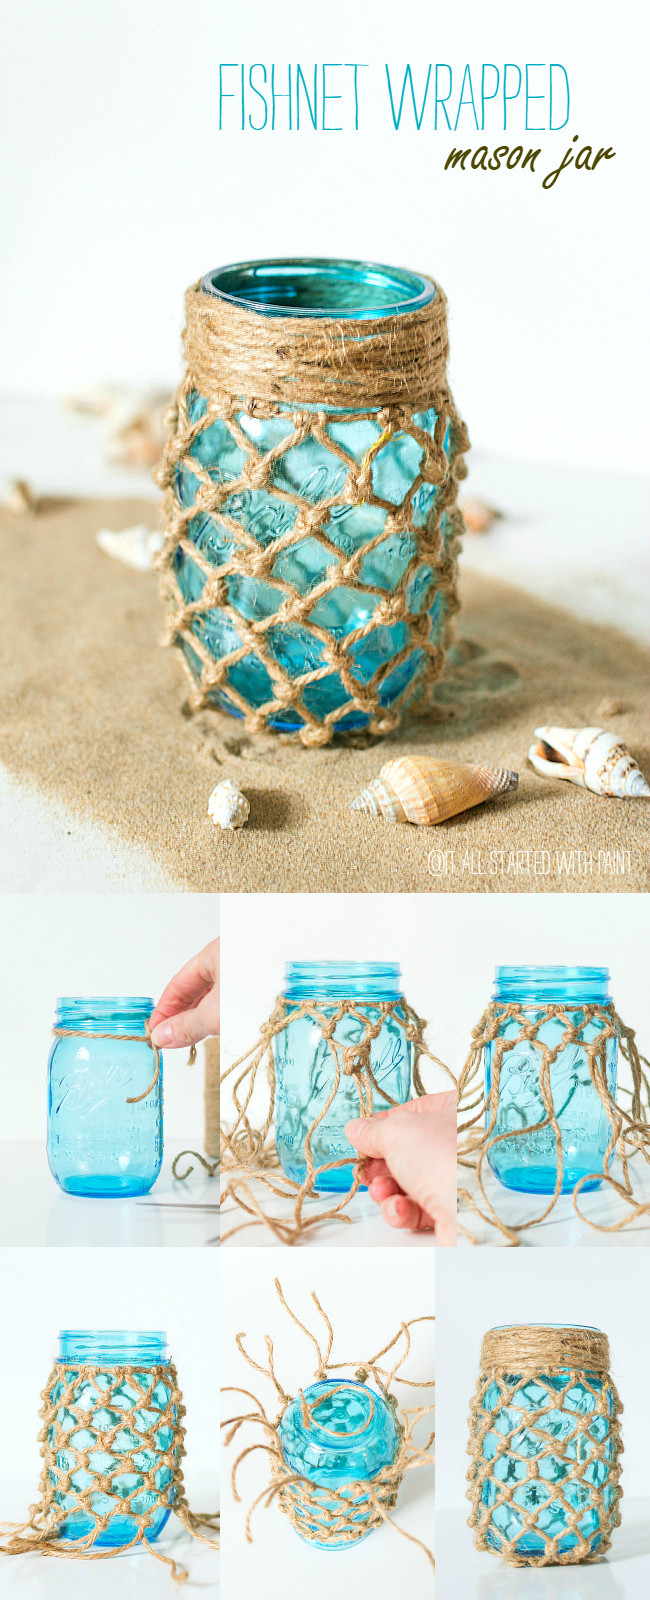 Best ideas about DIY Beach Wedding Ideas . Save or Pin Ten Inspirational DIY Mason Jar Ideas For Weddings Now.